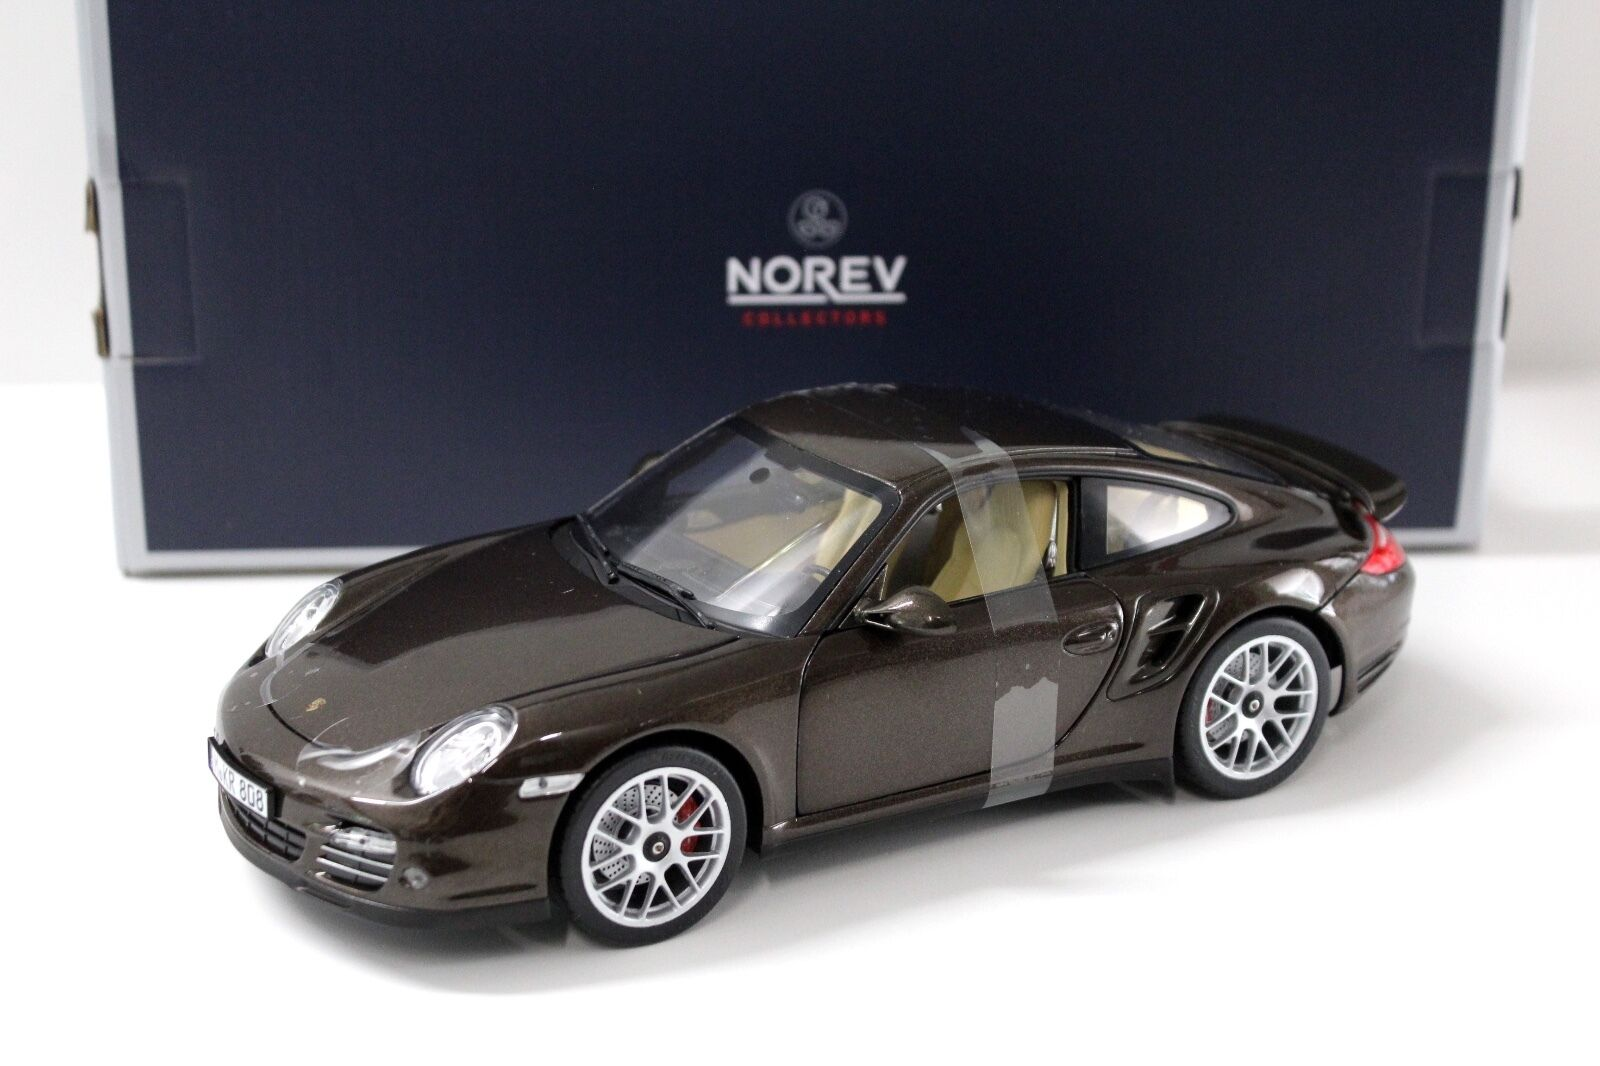 1 18 Norev Porsche 911 (997) Turbo 2010 marron Met. New chez Premium-modelcars